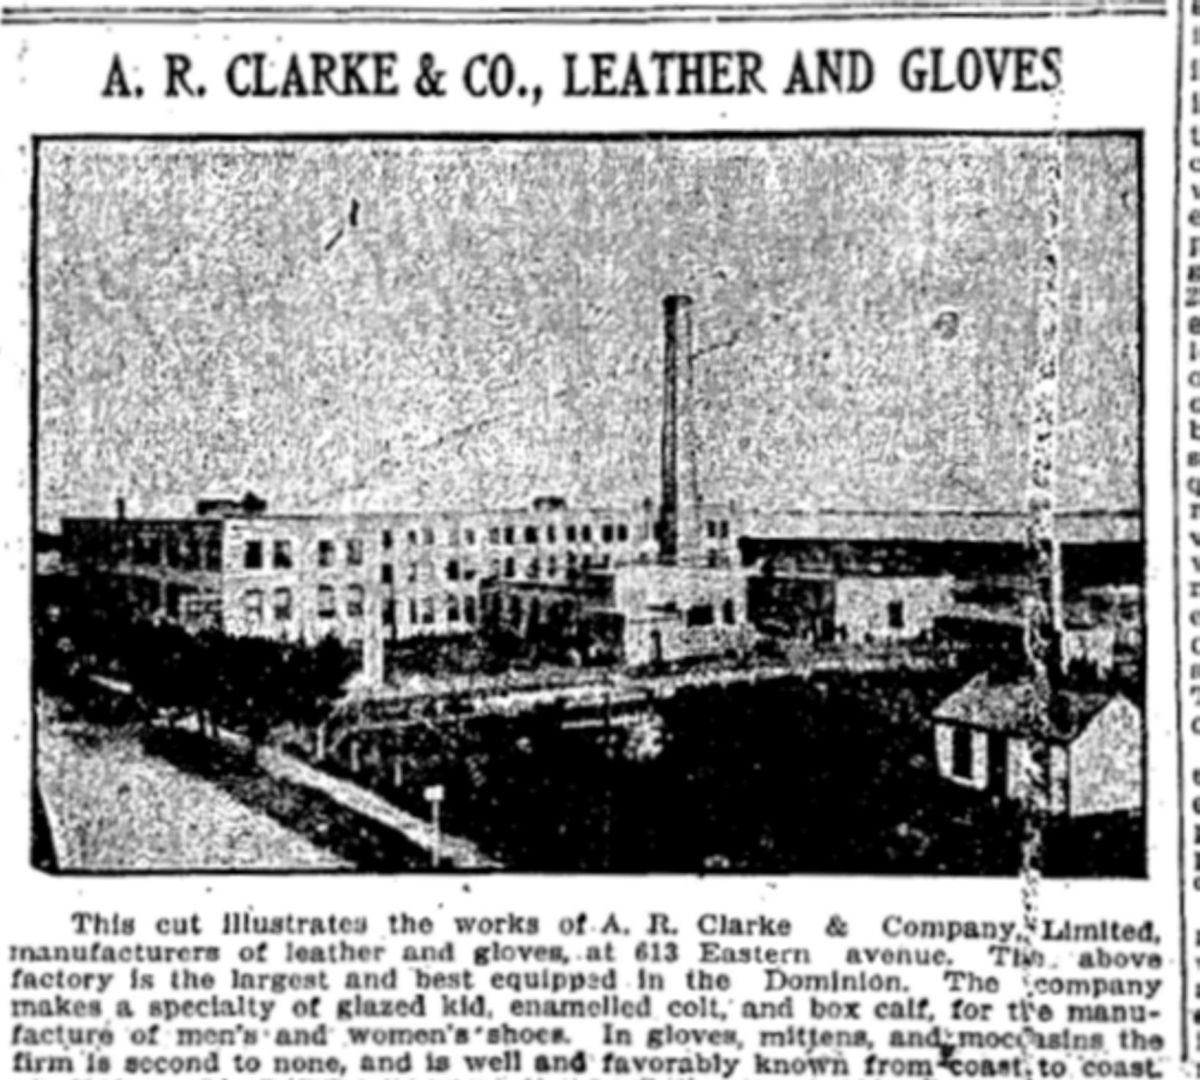 5 Toronto Star, June 23, 1905